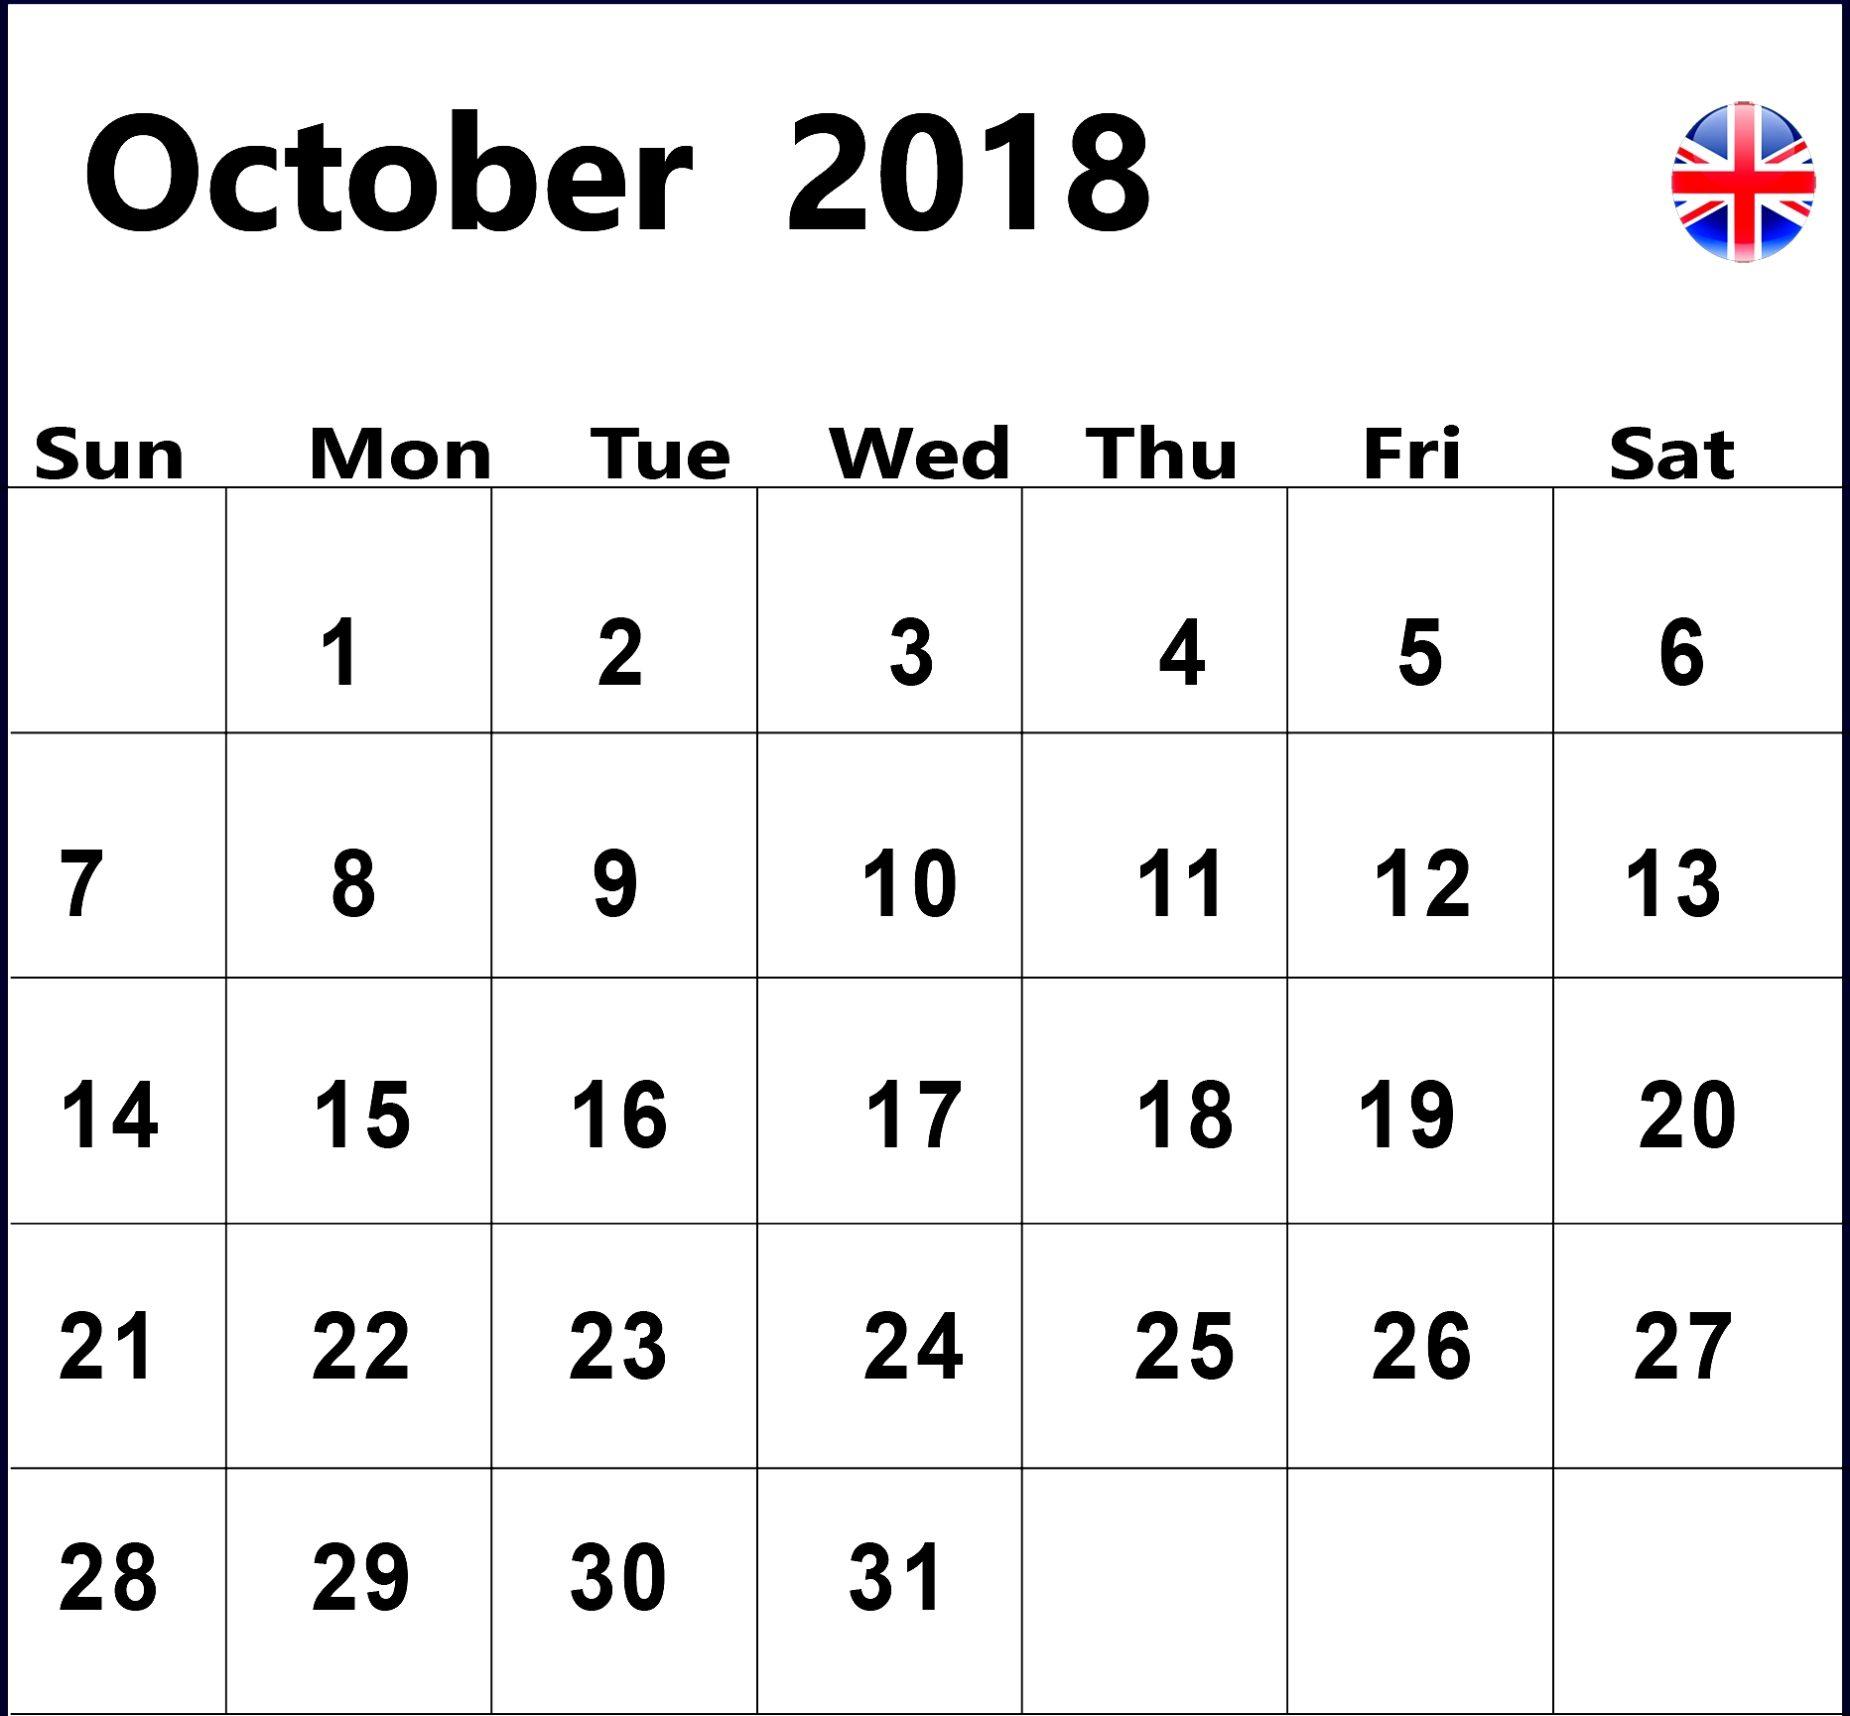 October 2018 UK Calendar